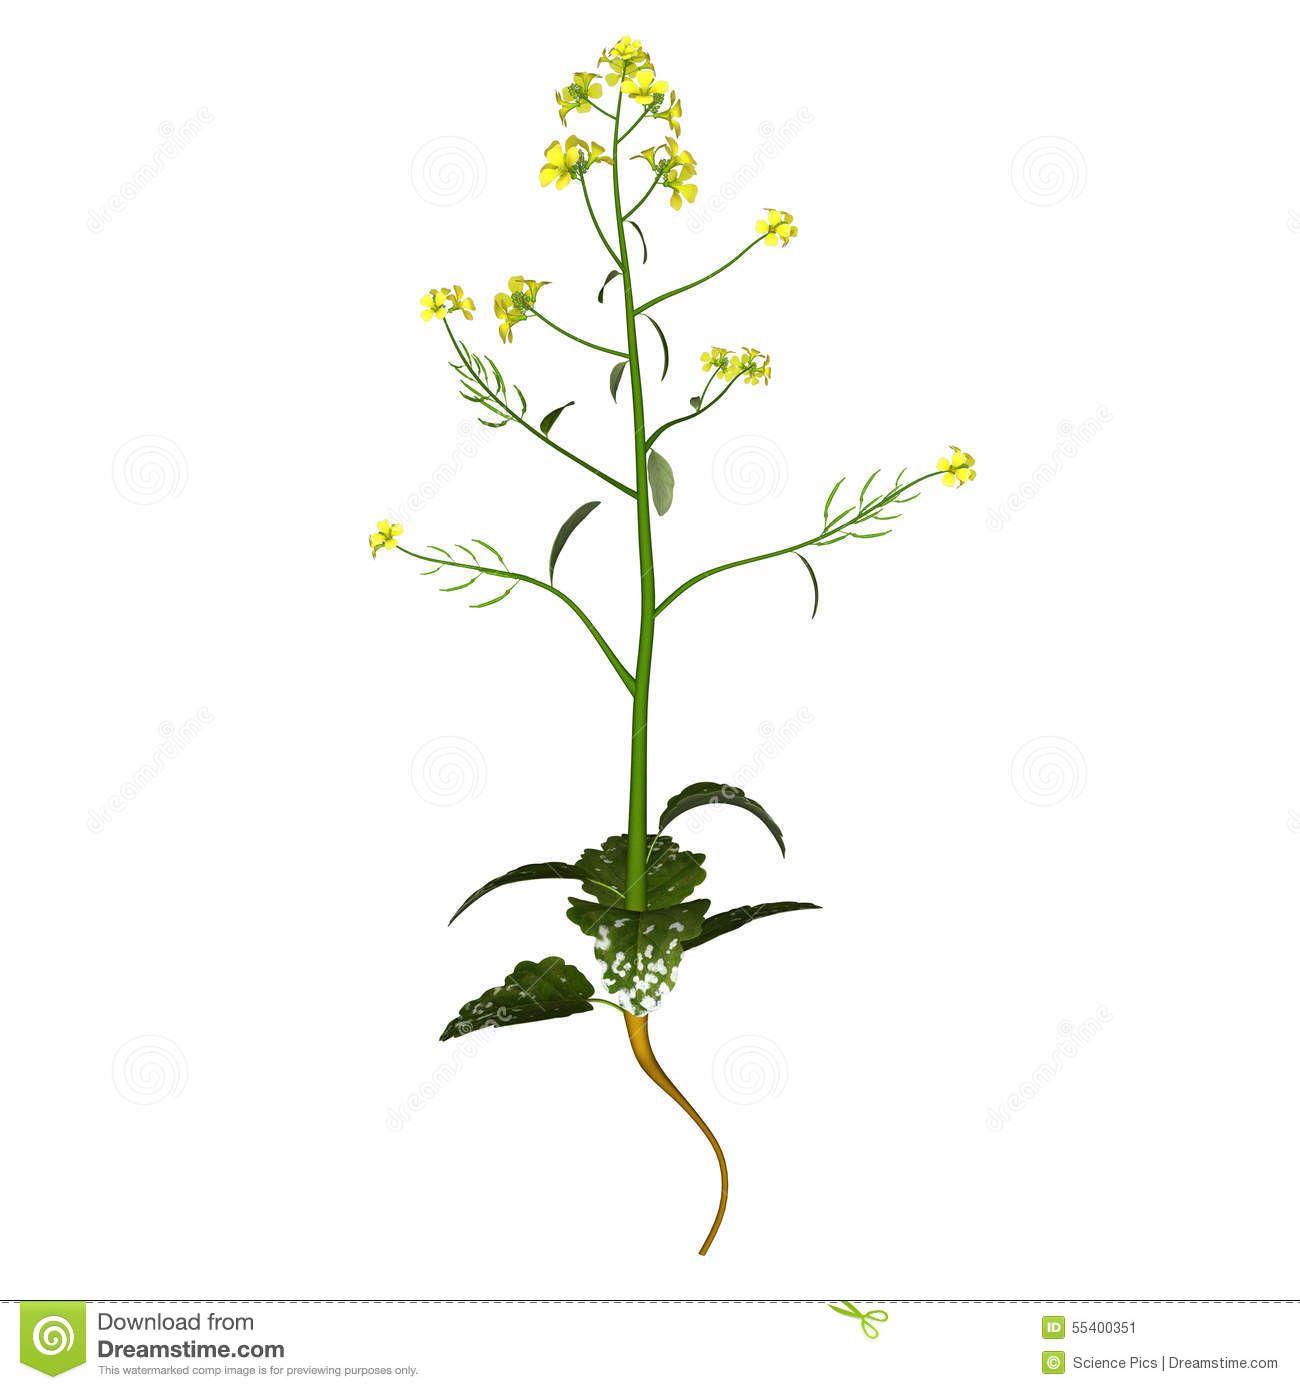 mustard-plant-plants-any-several-species-genera-brassica ...